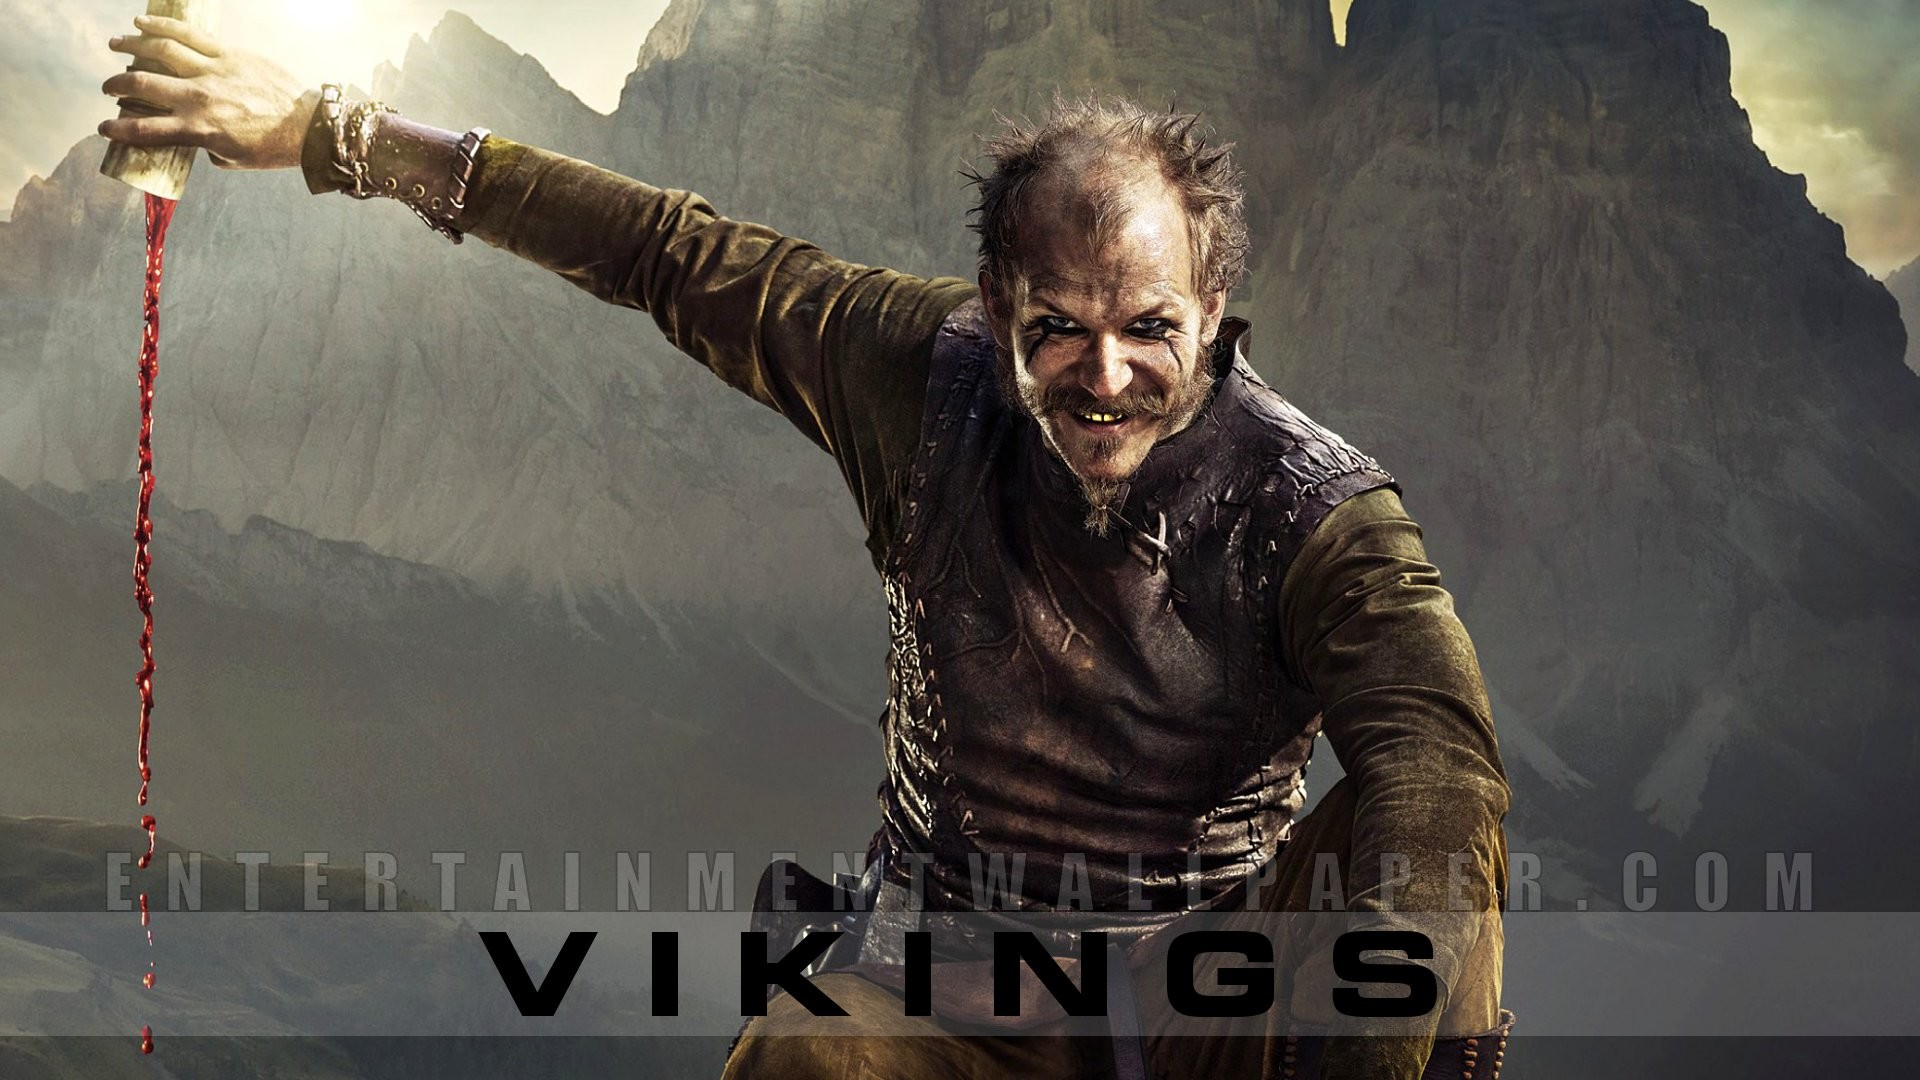 Wallpapers , Images & Photos pour vikings tv show wallpaper © w12.fr